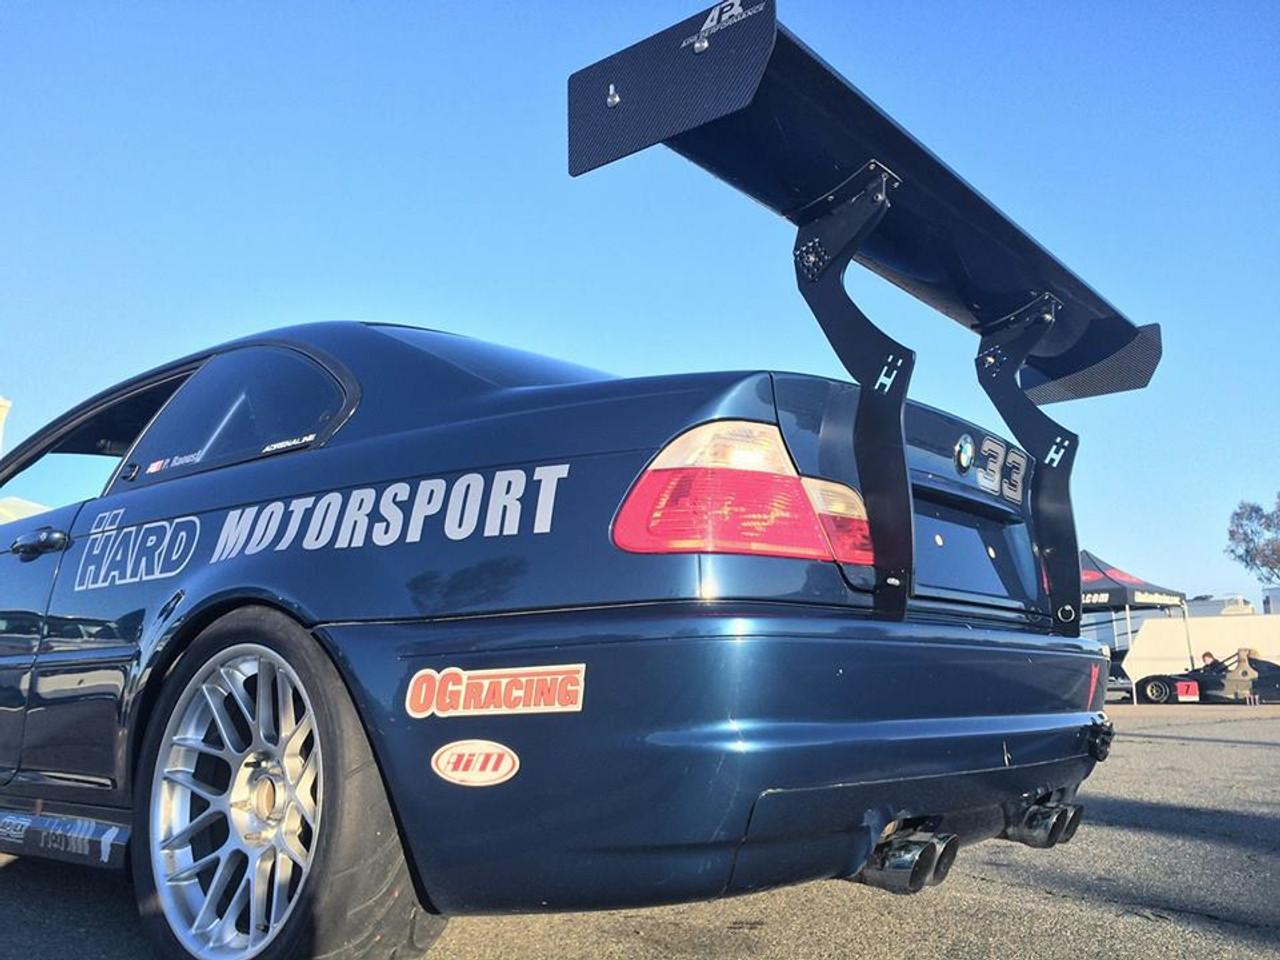 HARD Motorsport BMW E46 Upright Kit Installed on a customers car